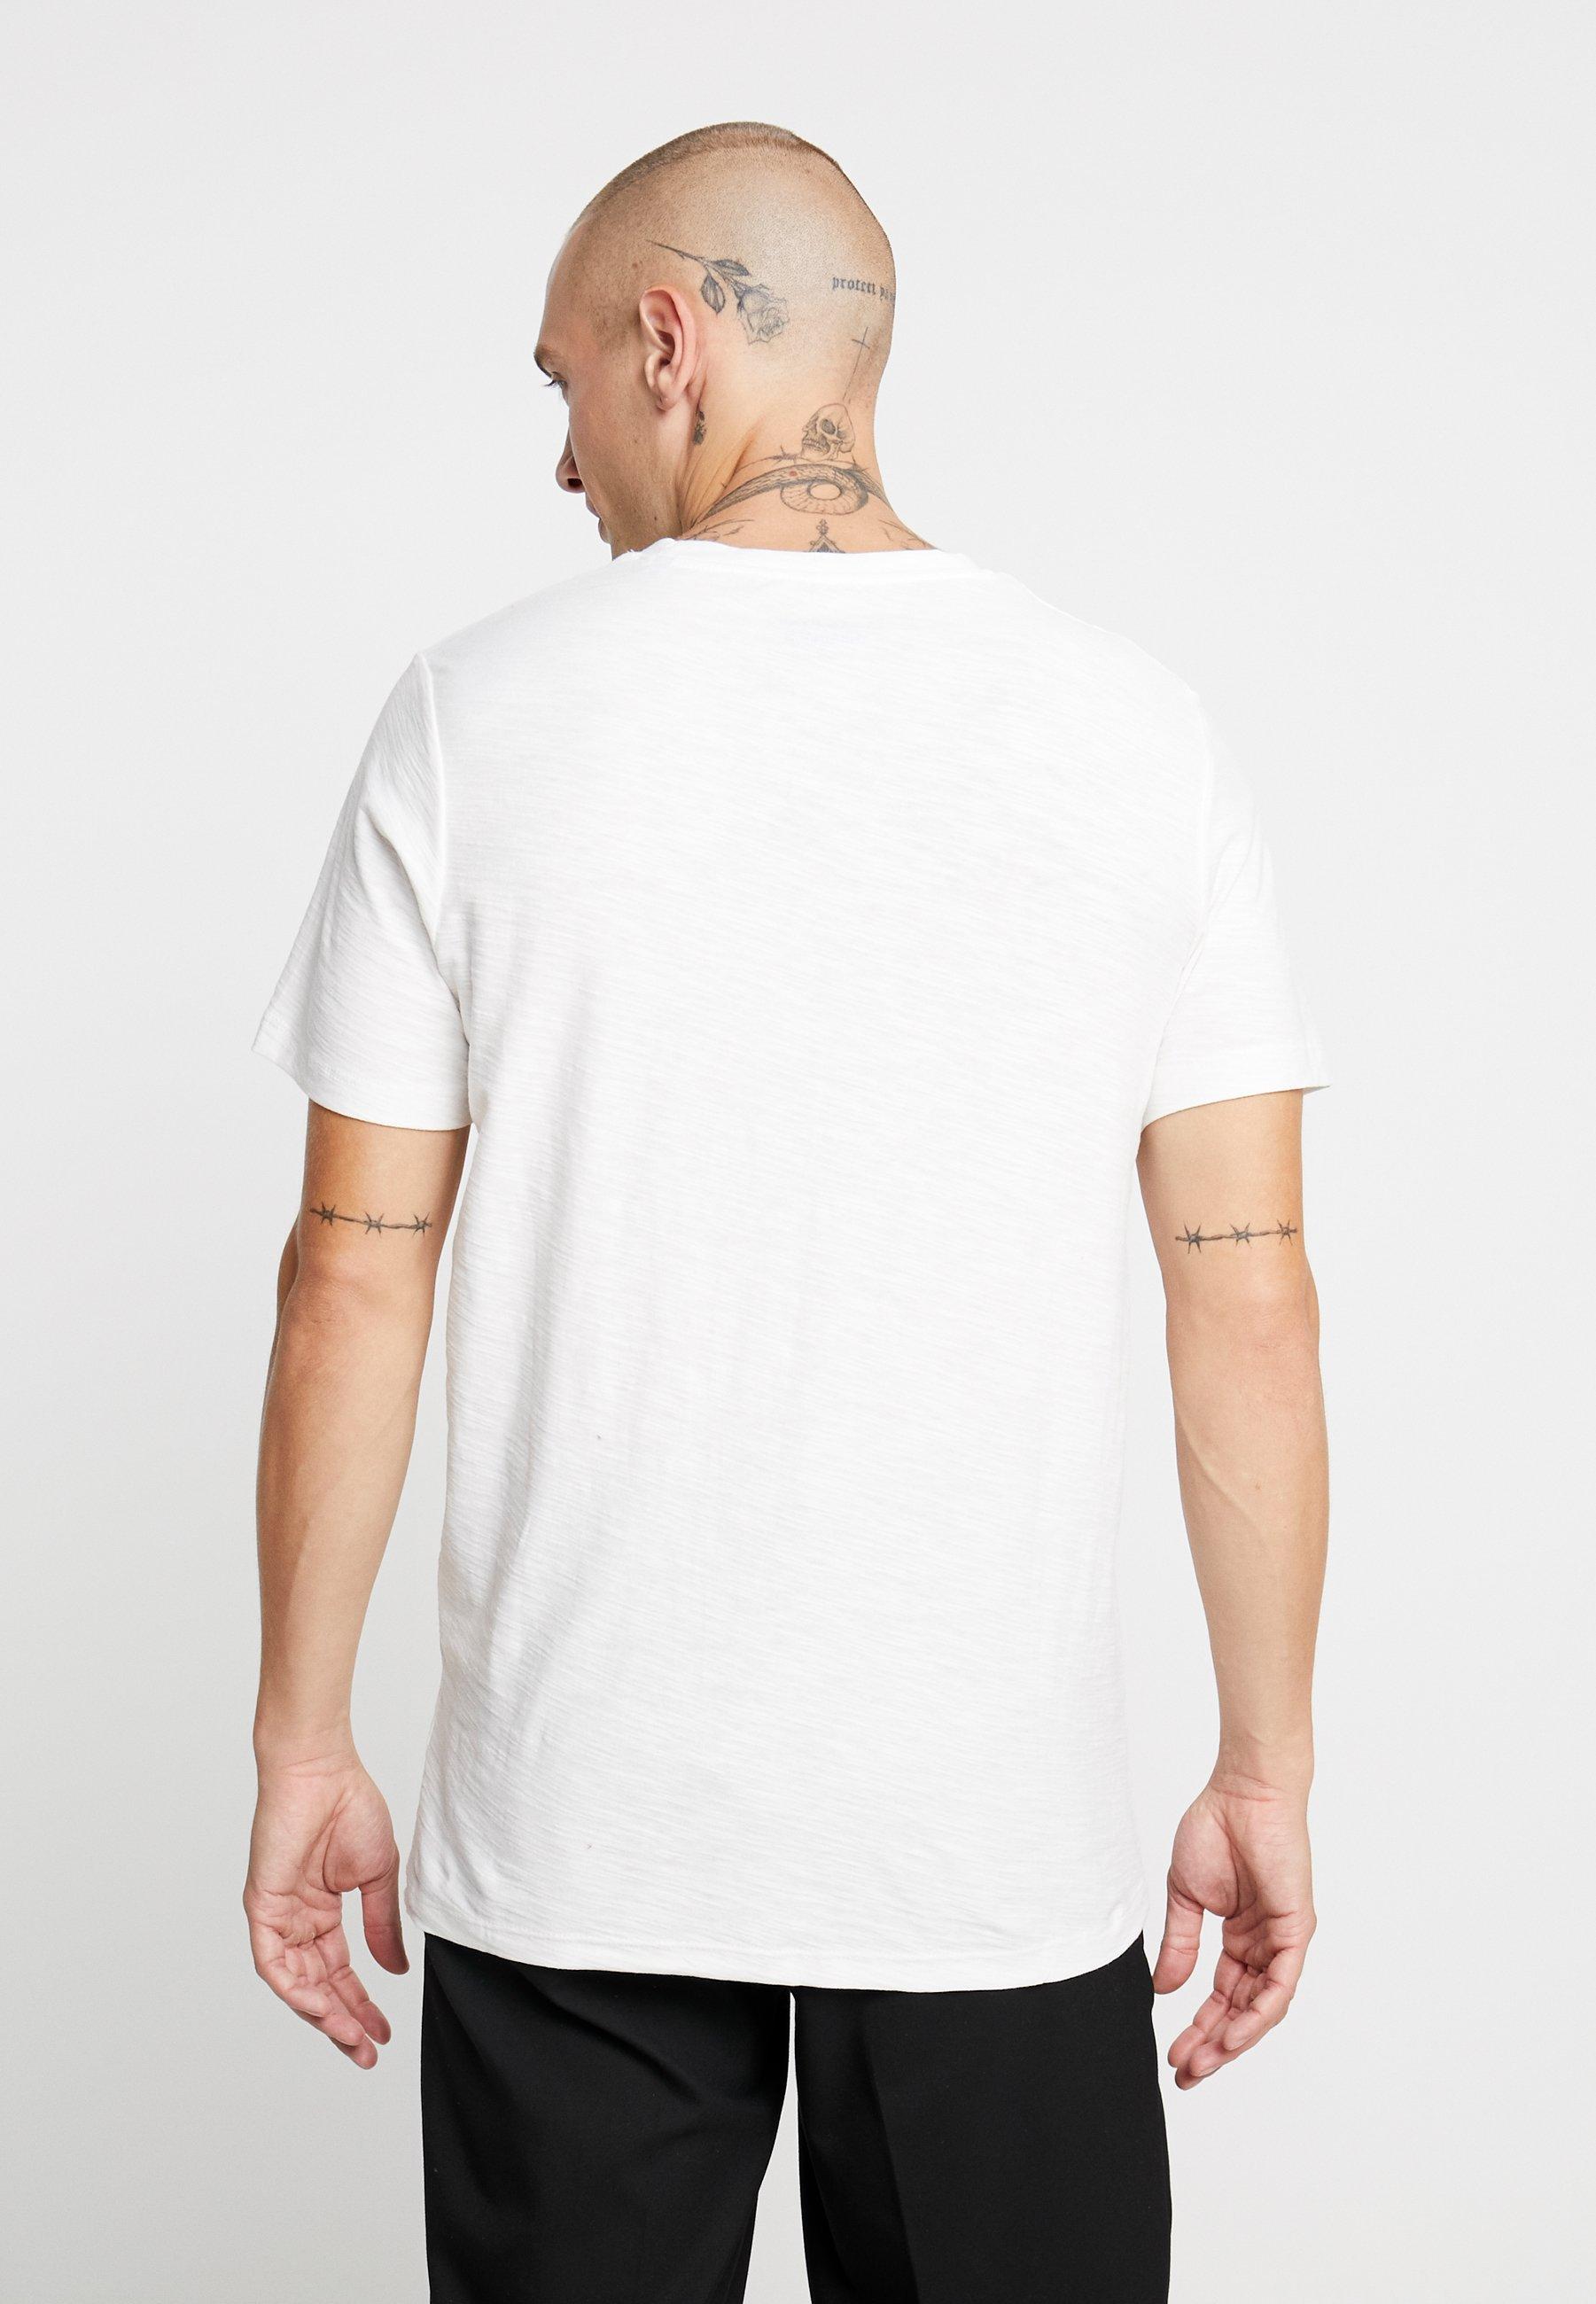 Dancer Imprimé Jackamp; Jorsprayed Crew NeckT Cloud Jones Tee shirt n0mvOyN8w